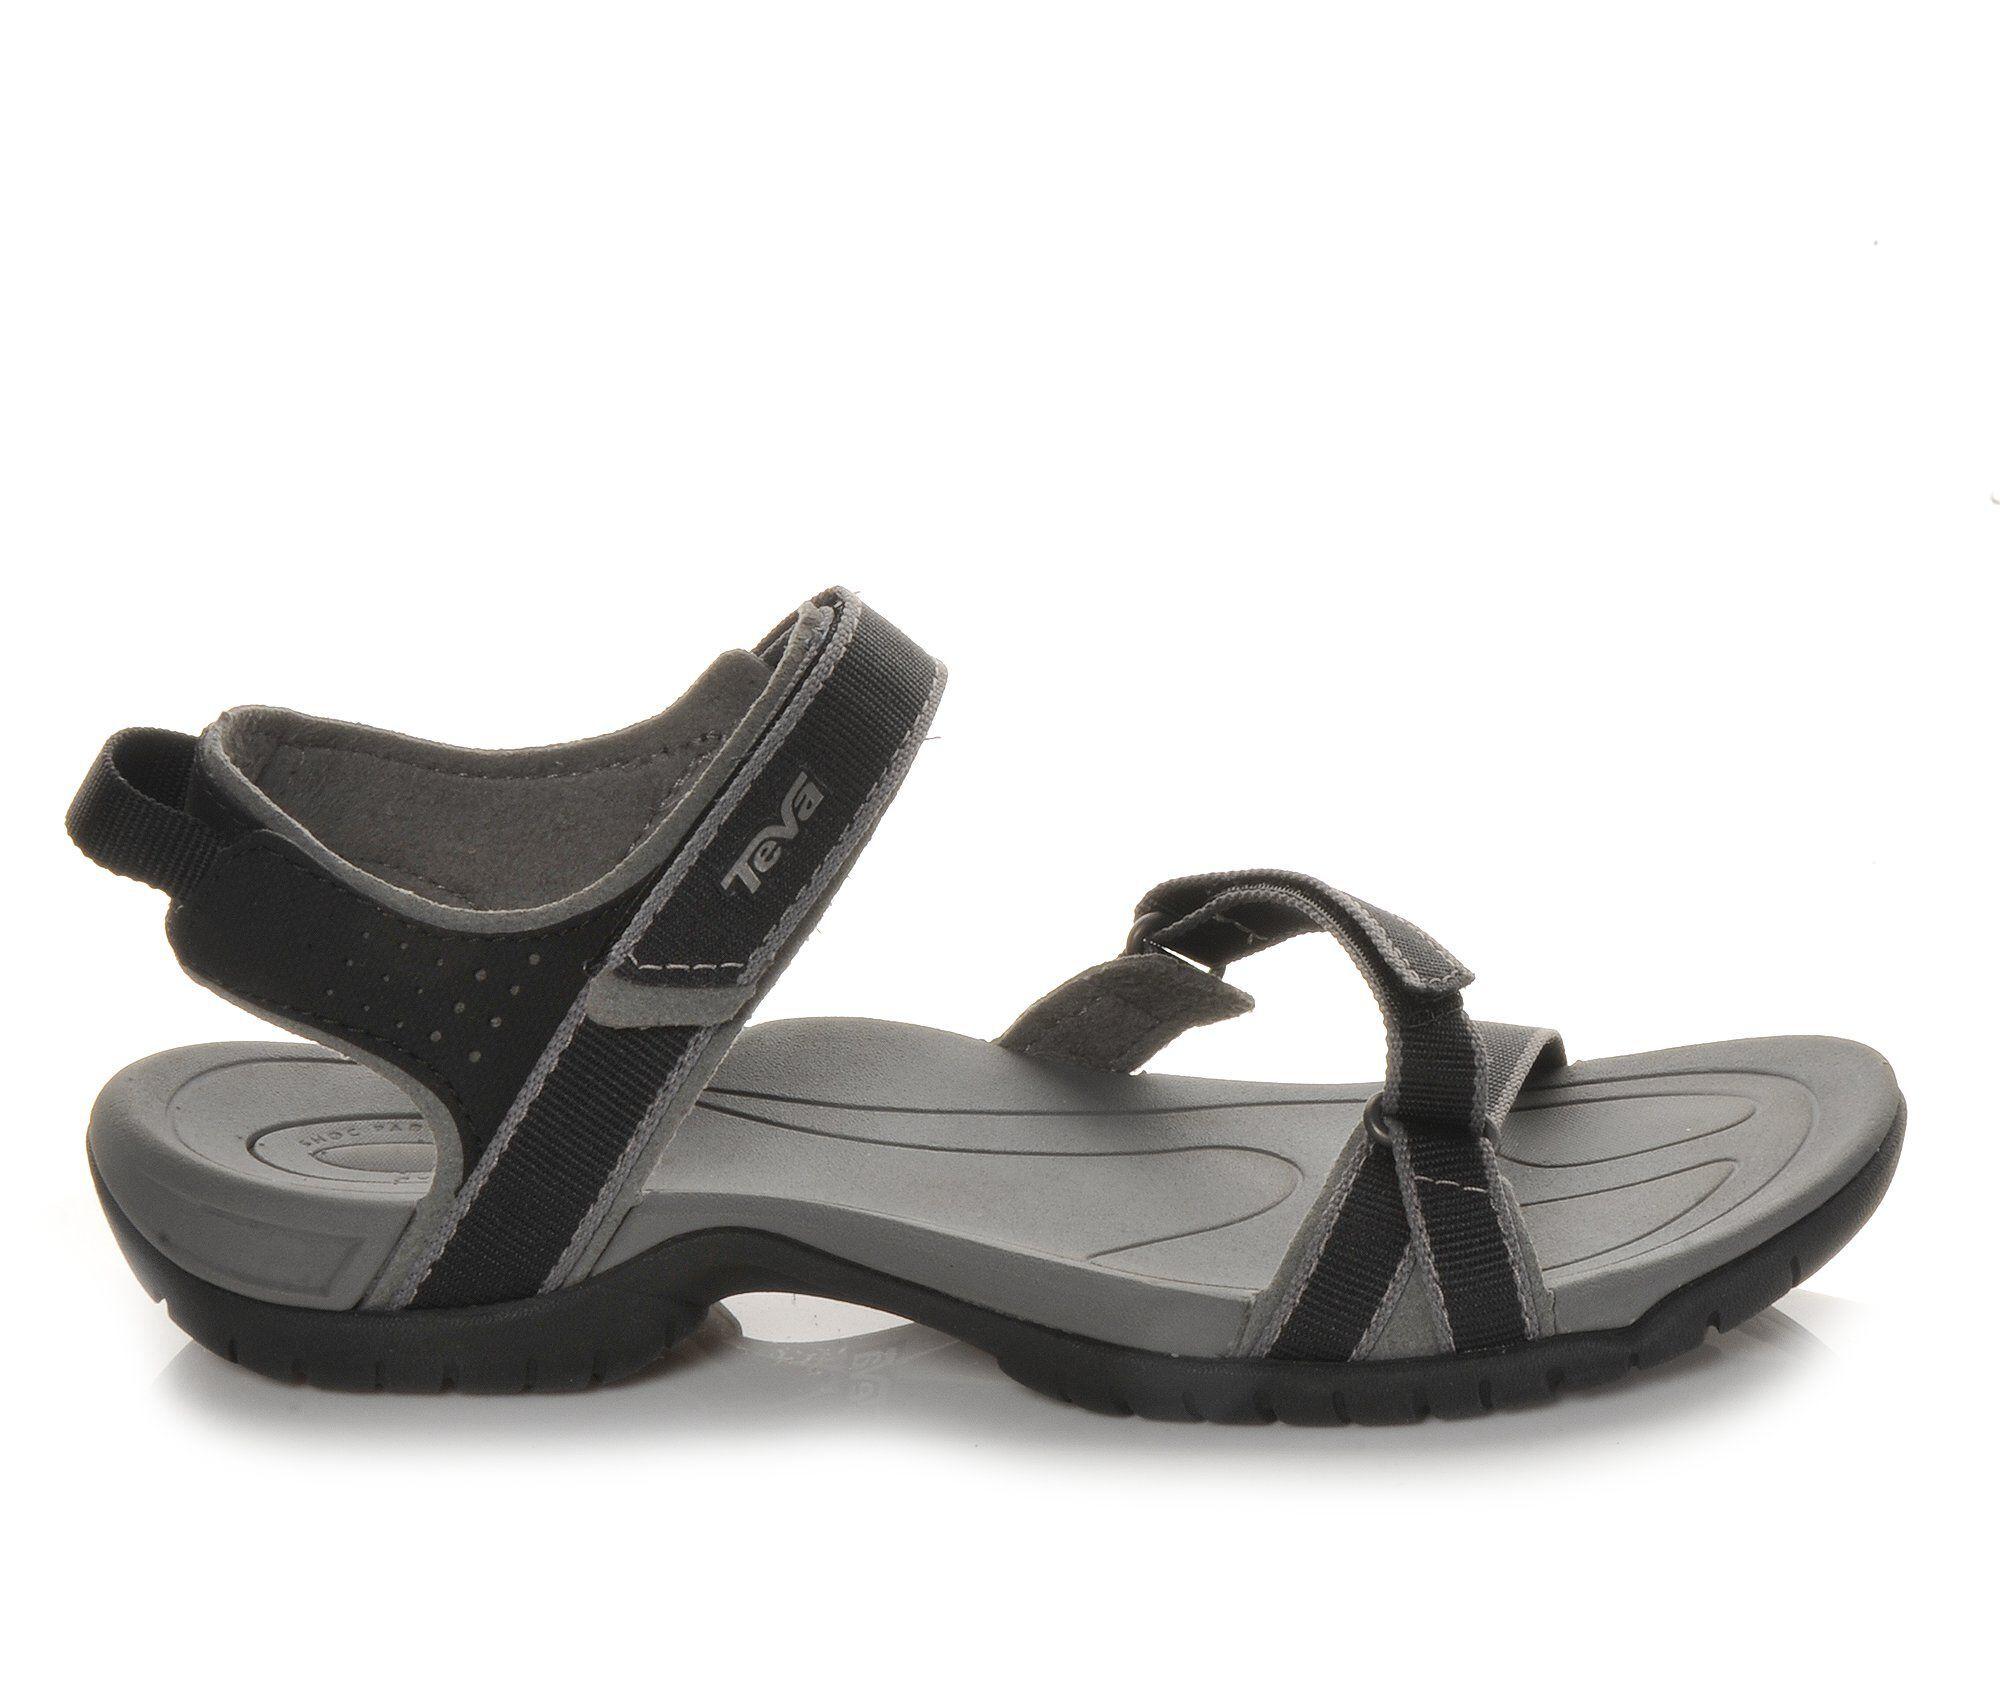 Women's Teva Verra Hiking Sandals Black